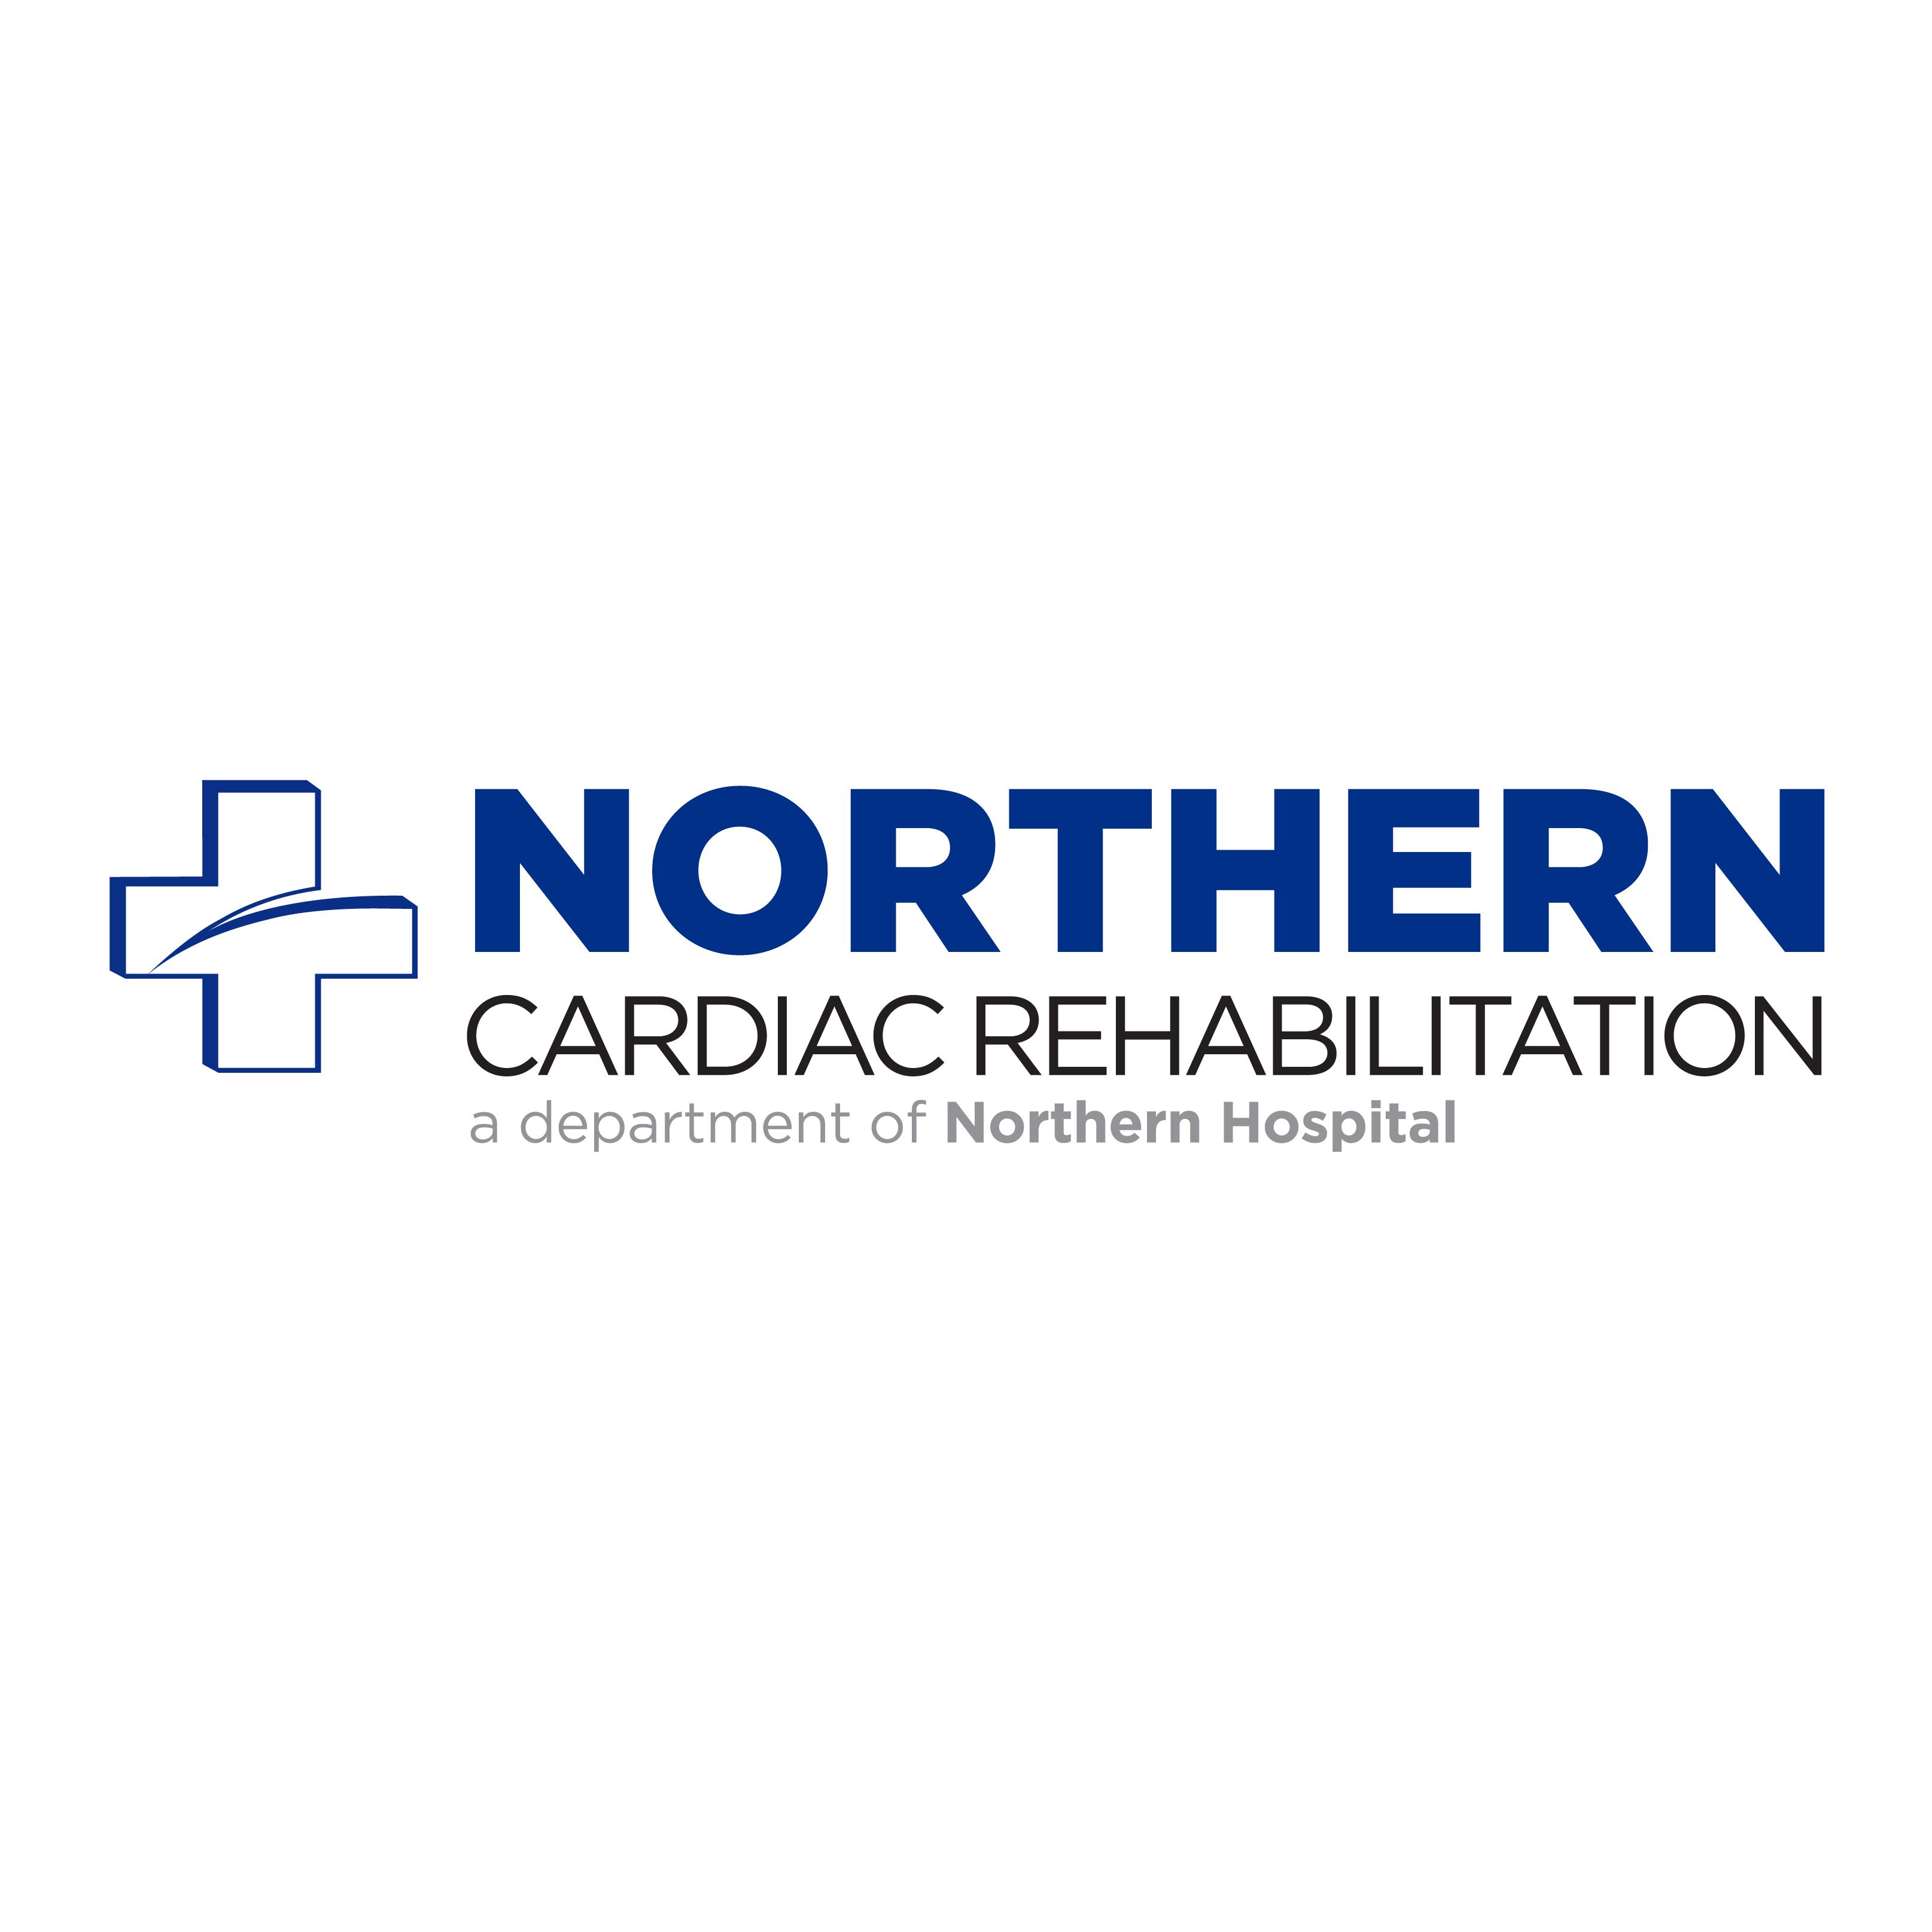 Northern Cardiac Rehabilitation